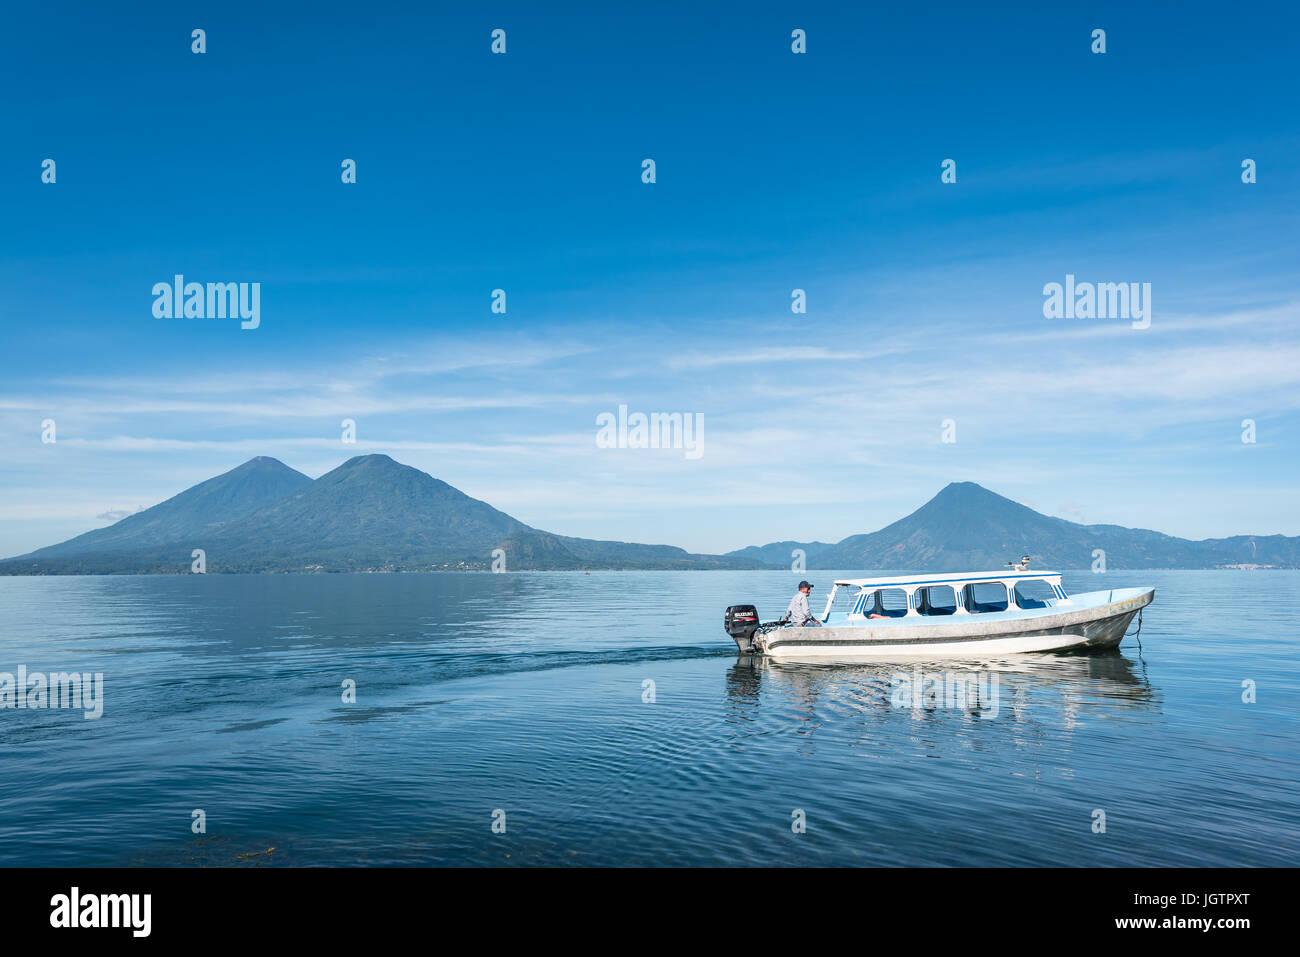 Central America, Guatemala, Lago de, Atitlan, lake, Santiago, fisherman, boat, indian, maya, native, mundo maya. - Stock Image